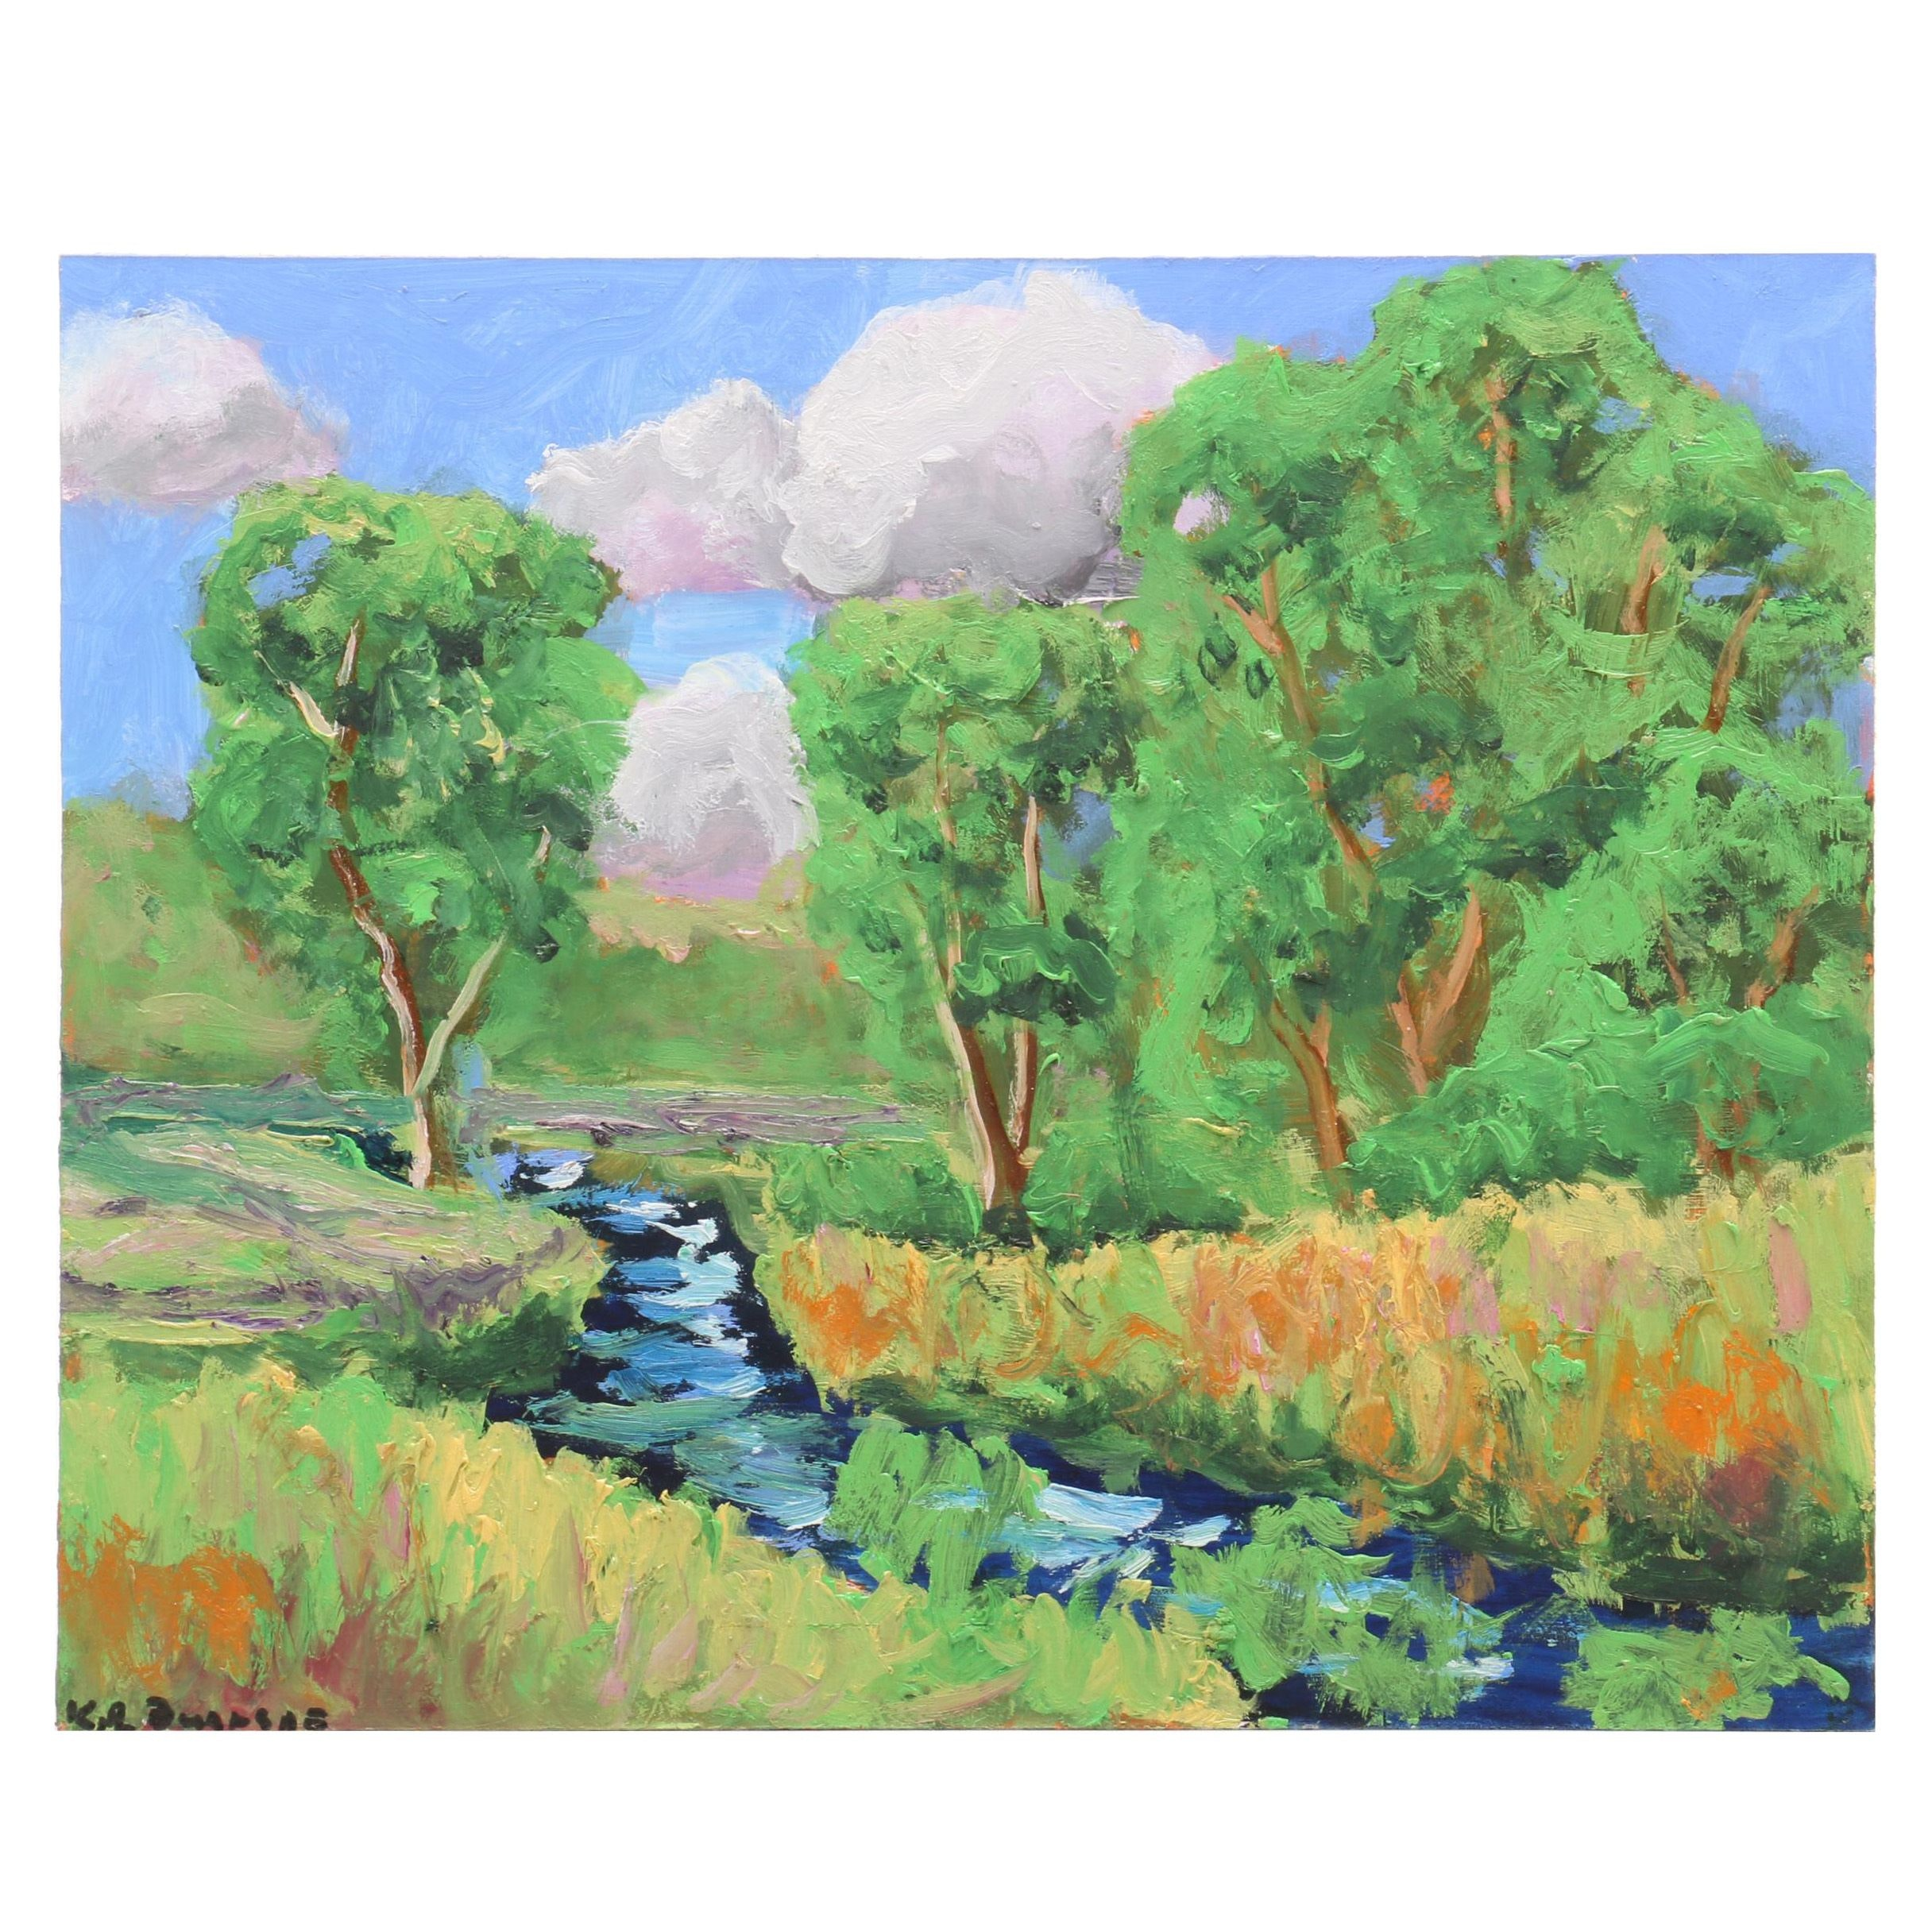 Kenneth Burnside Landscape Oil Painting